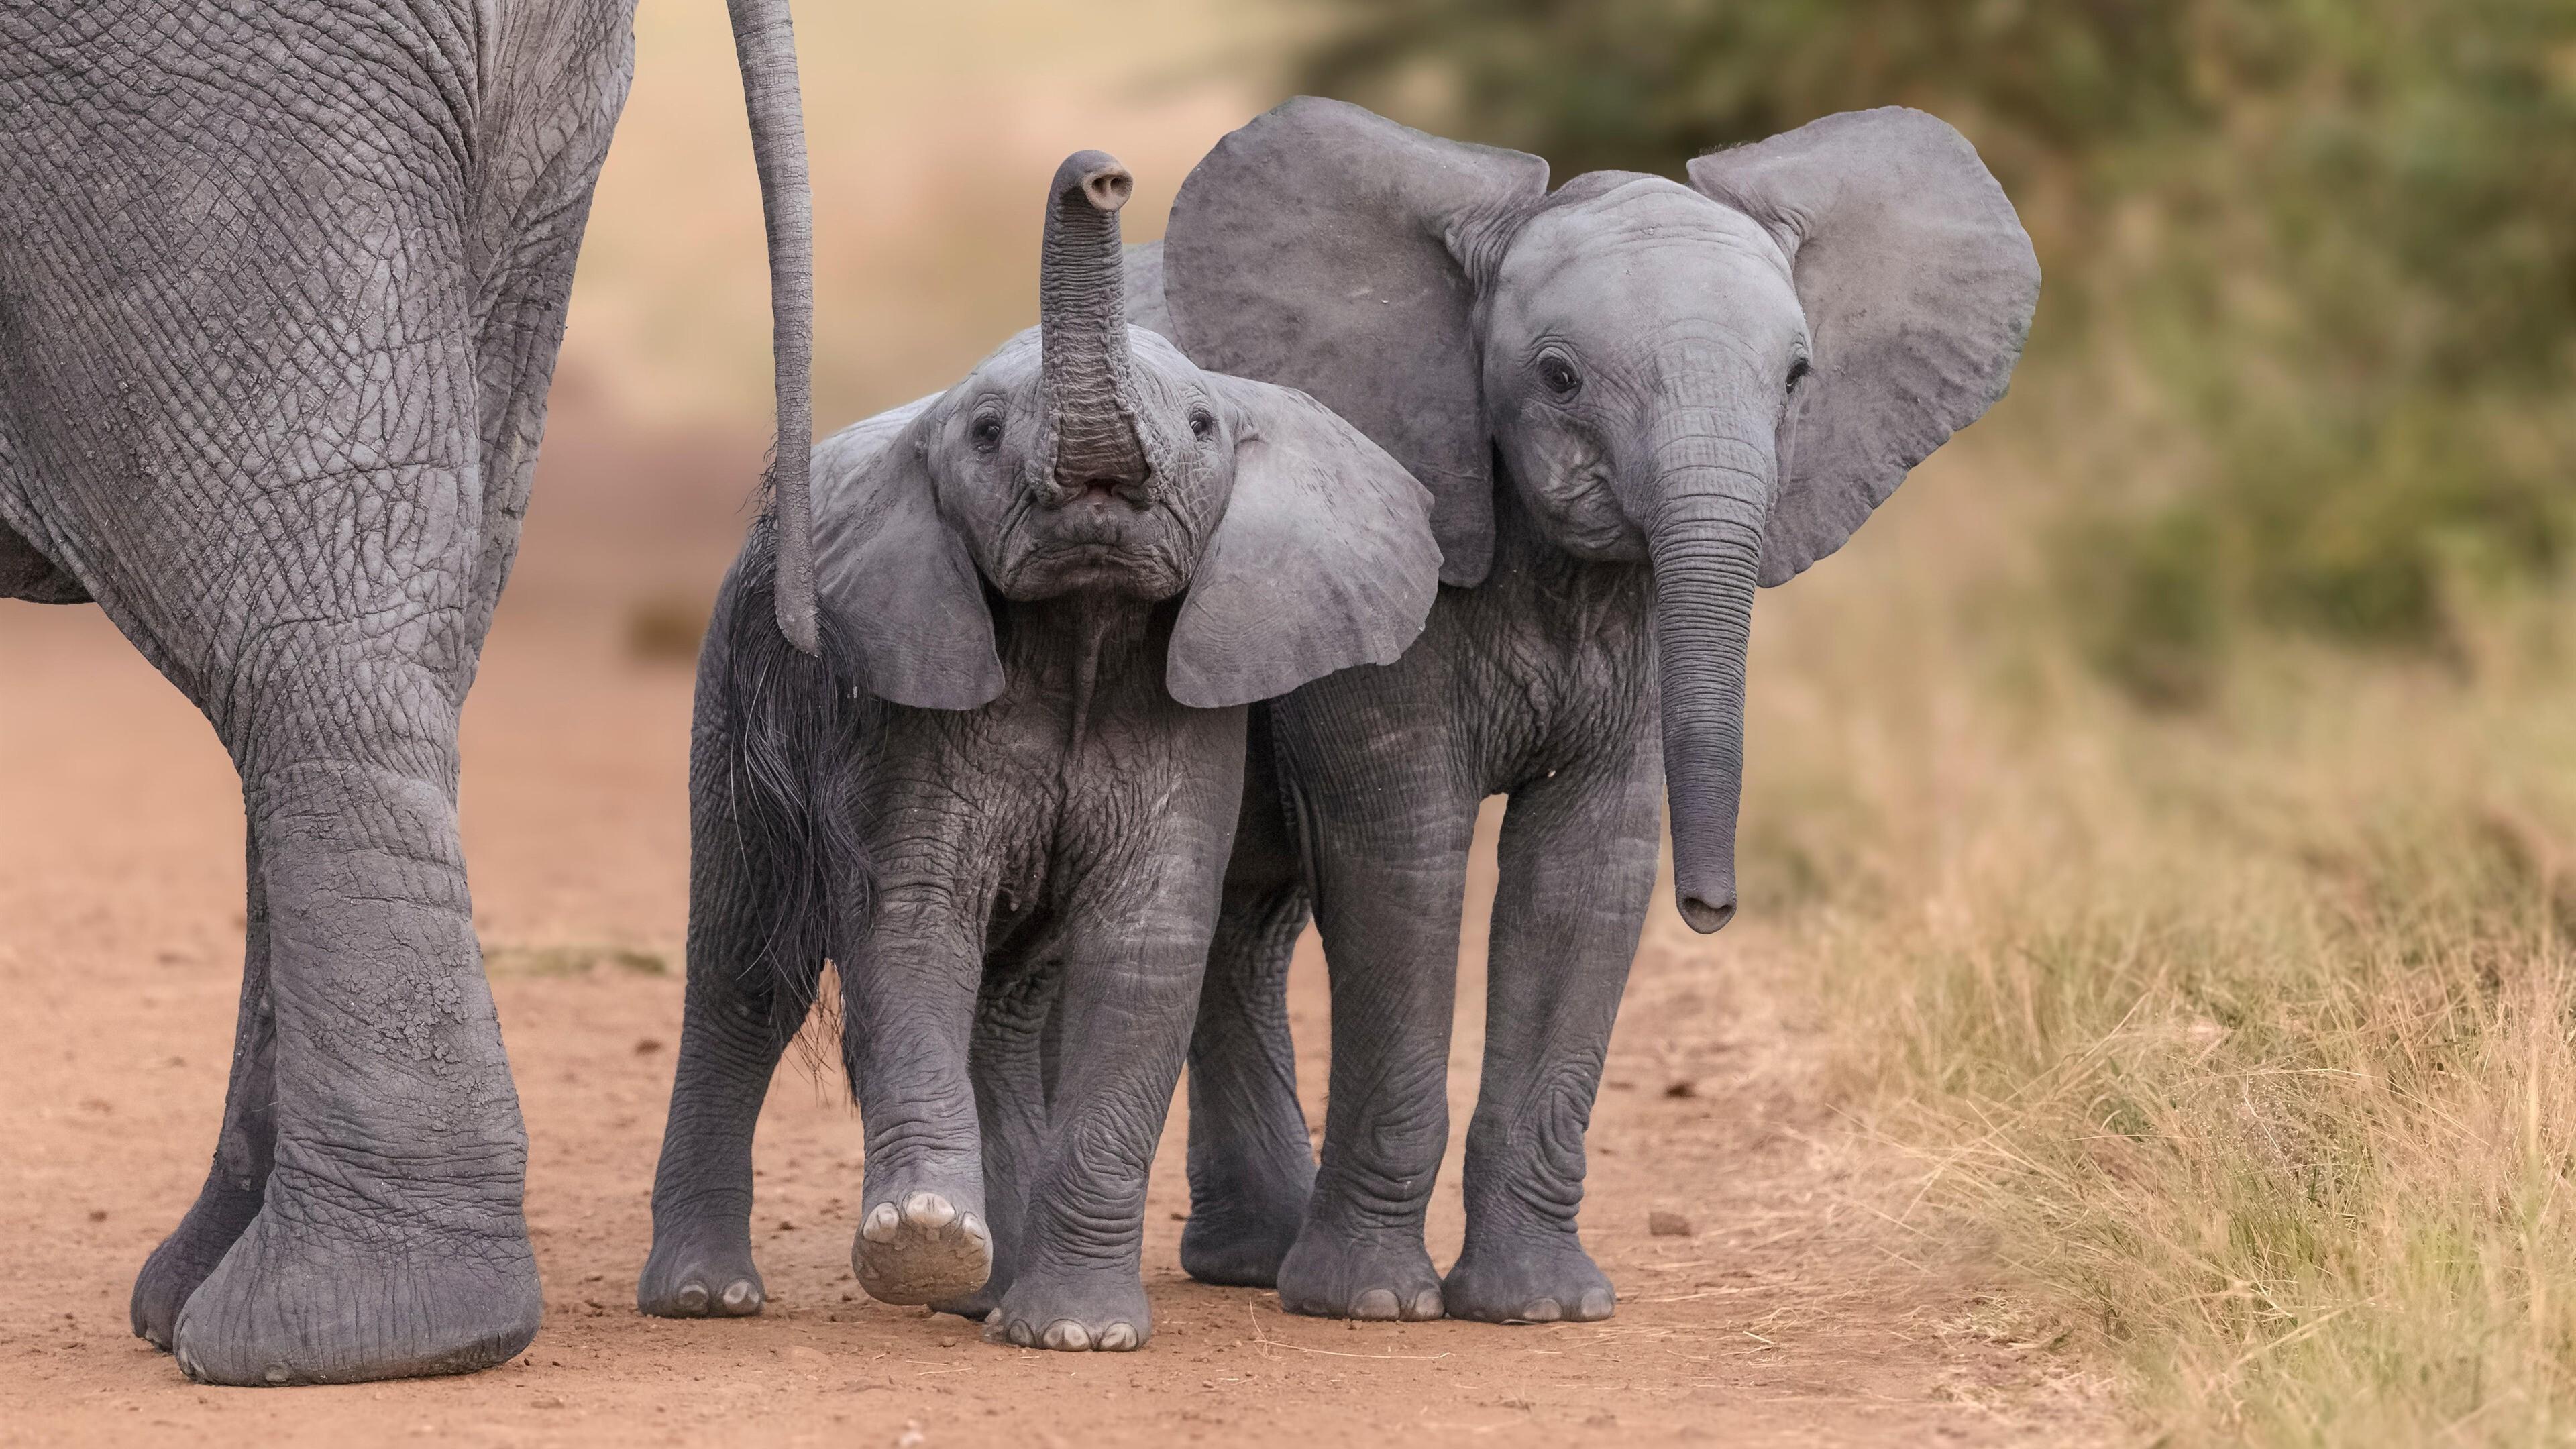 2 Lovely Elephant Child 4K Wallpaper | HD Wallpapers